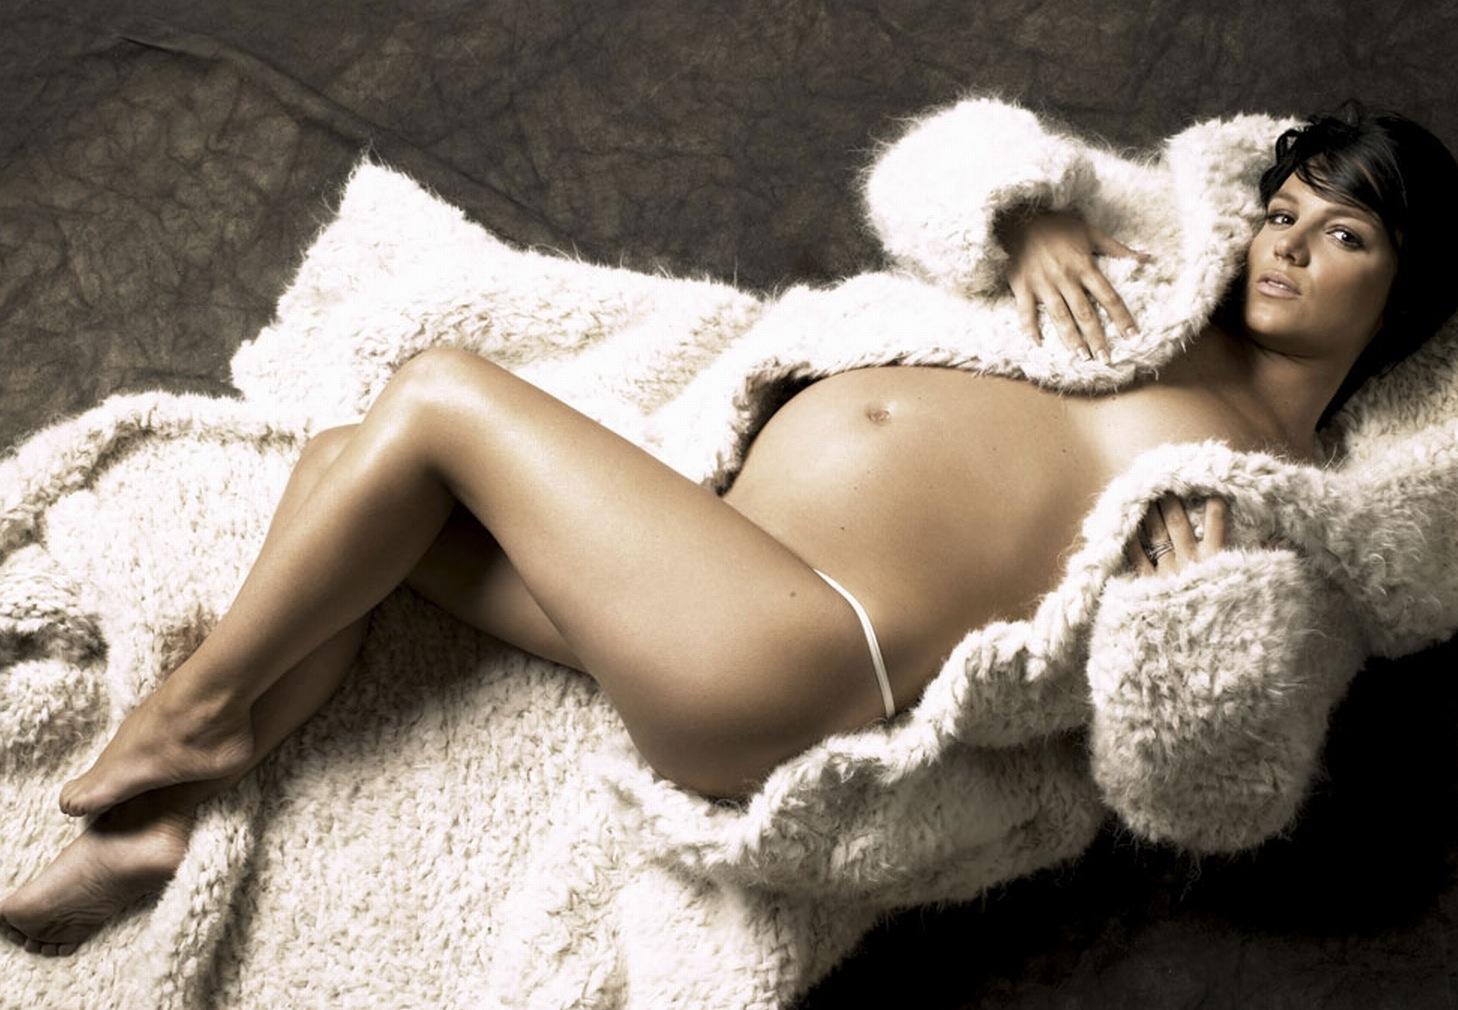 http://1.bp.blogspot.com/-t4hSrS5uUPc/T4QvYemqsPI/AAAAAAAAGhg/_dFx-VHDAIA/s1600/pregnant+sexy+++pictures+++Britney++Spears+1.jpg